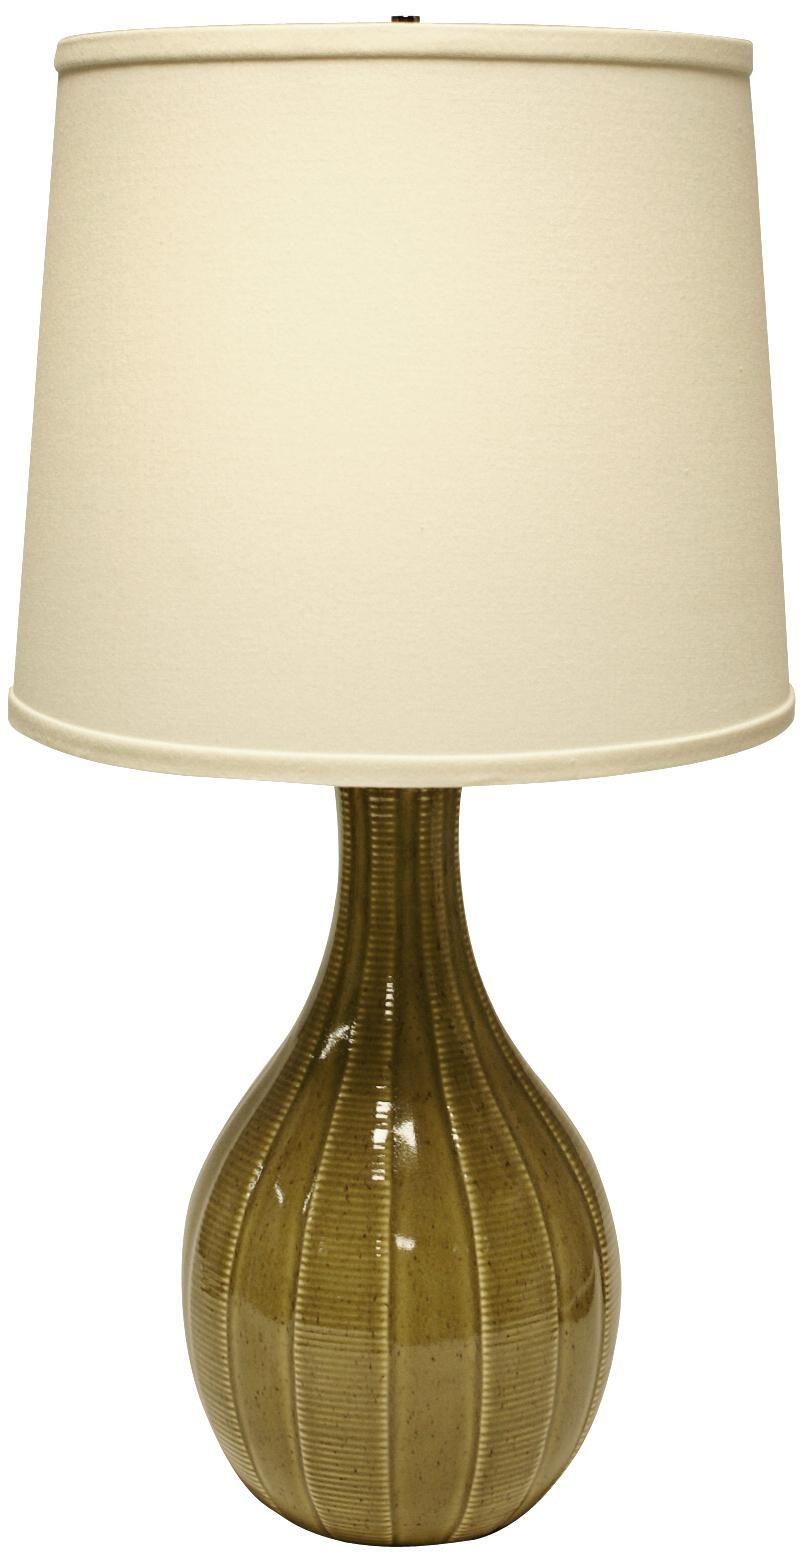 Haeger Potteries Sage Ceramic Tile Table Lamp U4982 Lamps Plus Ceramic Tiles Tile Tables Table Lamp